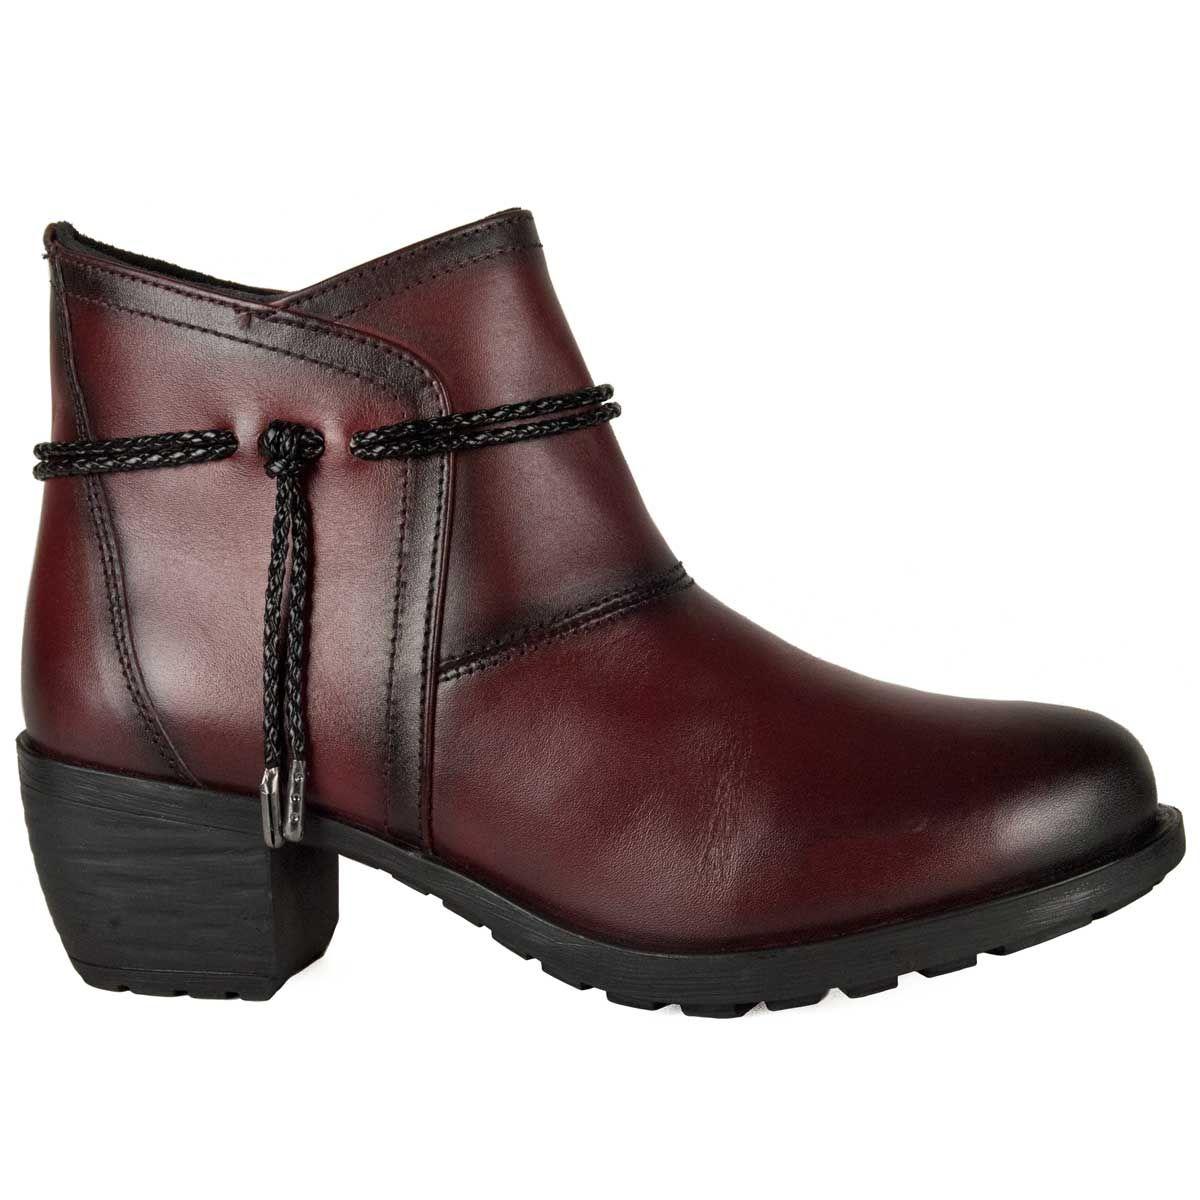 Purapiel Cord Tie Heeled Ankle Boot in Bordo